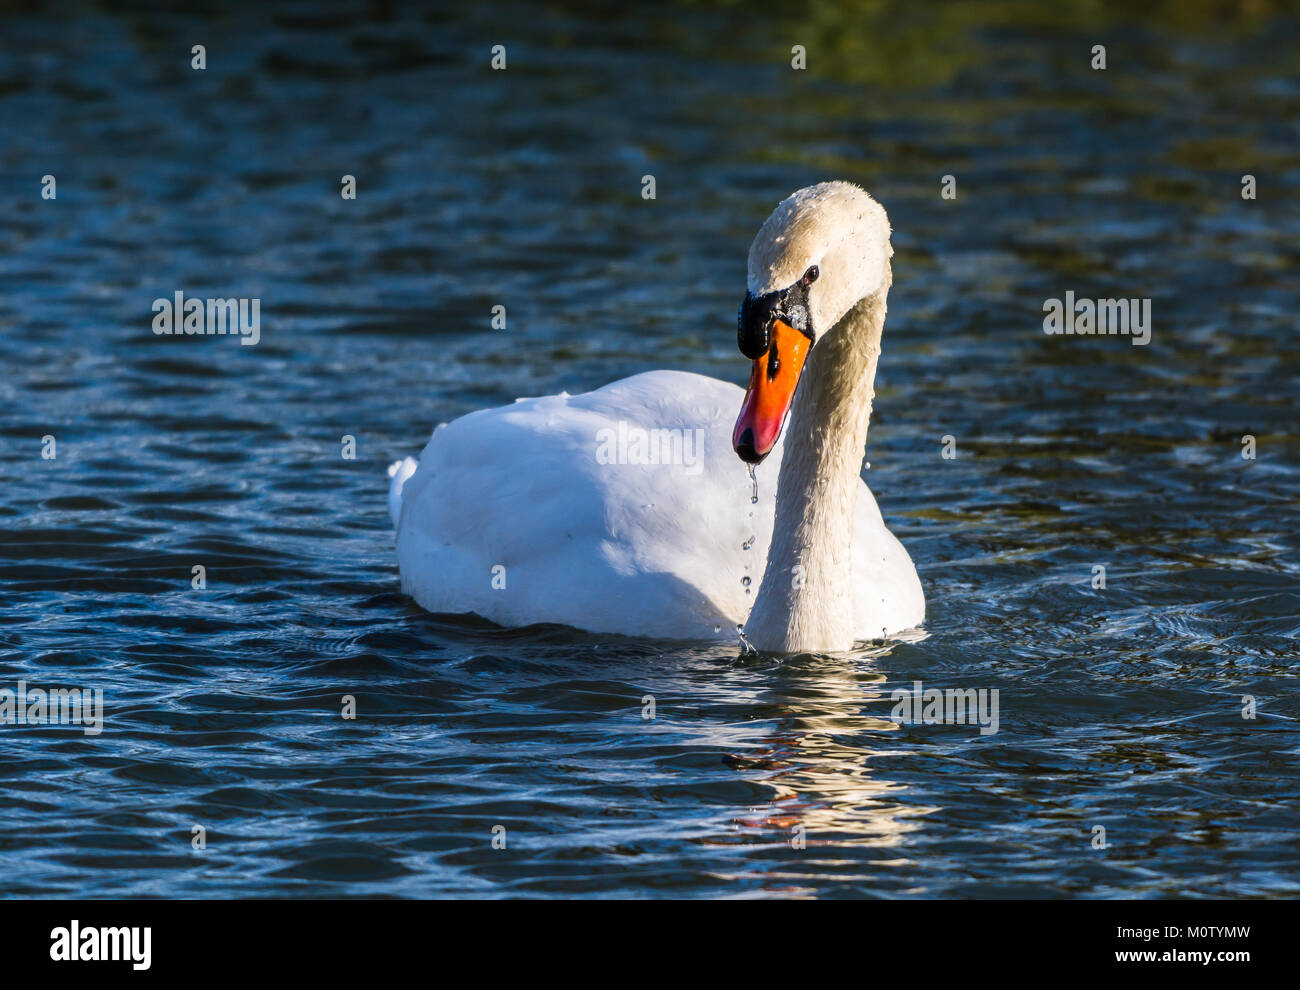 Cygne muet sur l'Octogone Lake, Stowe, Buckinghamshire, UK Banque D'Images